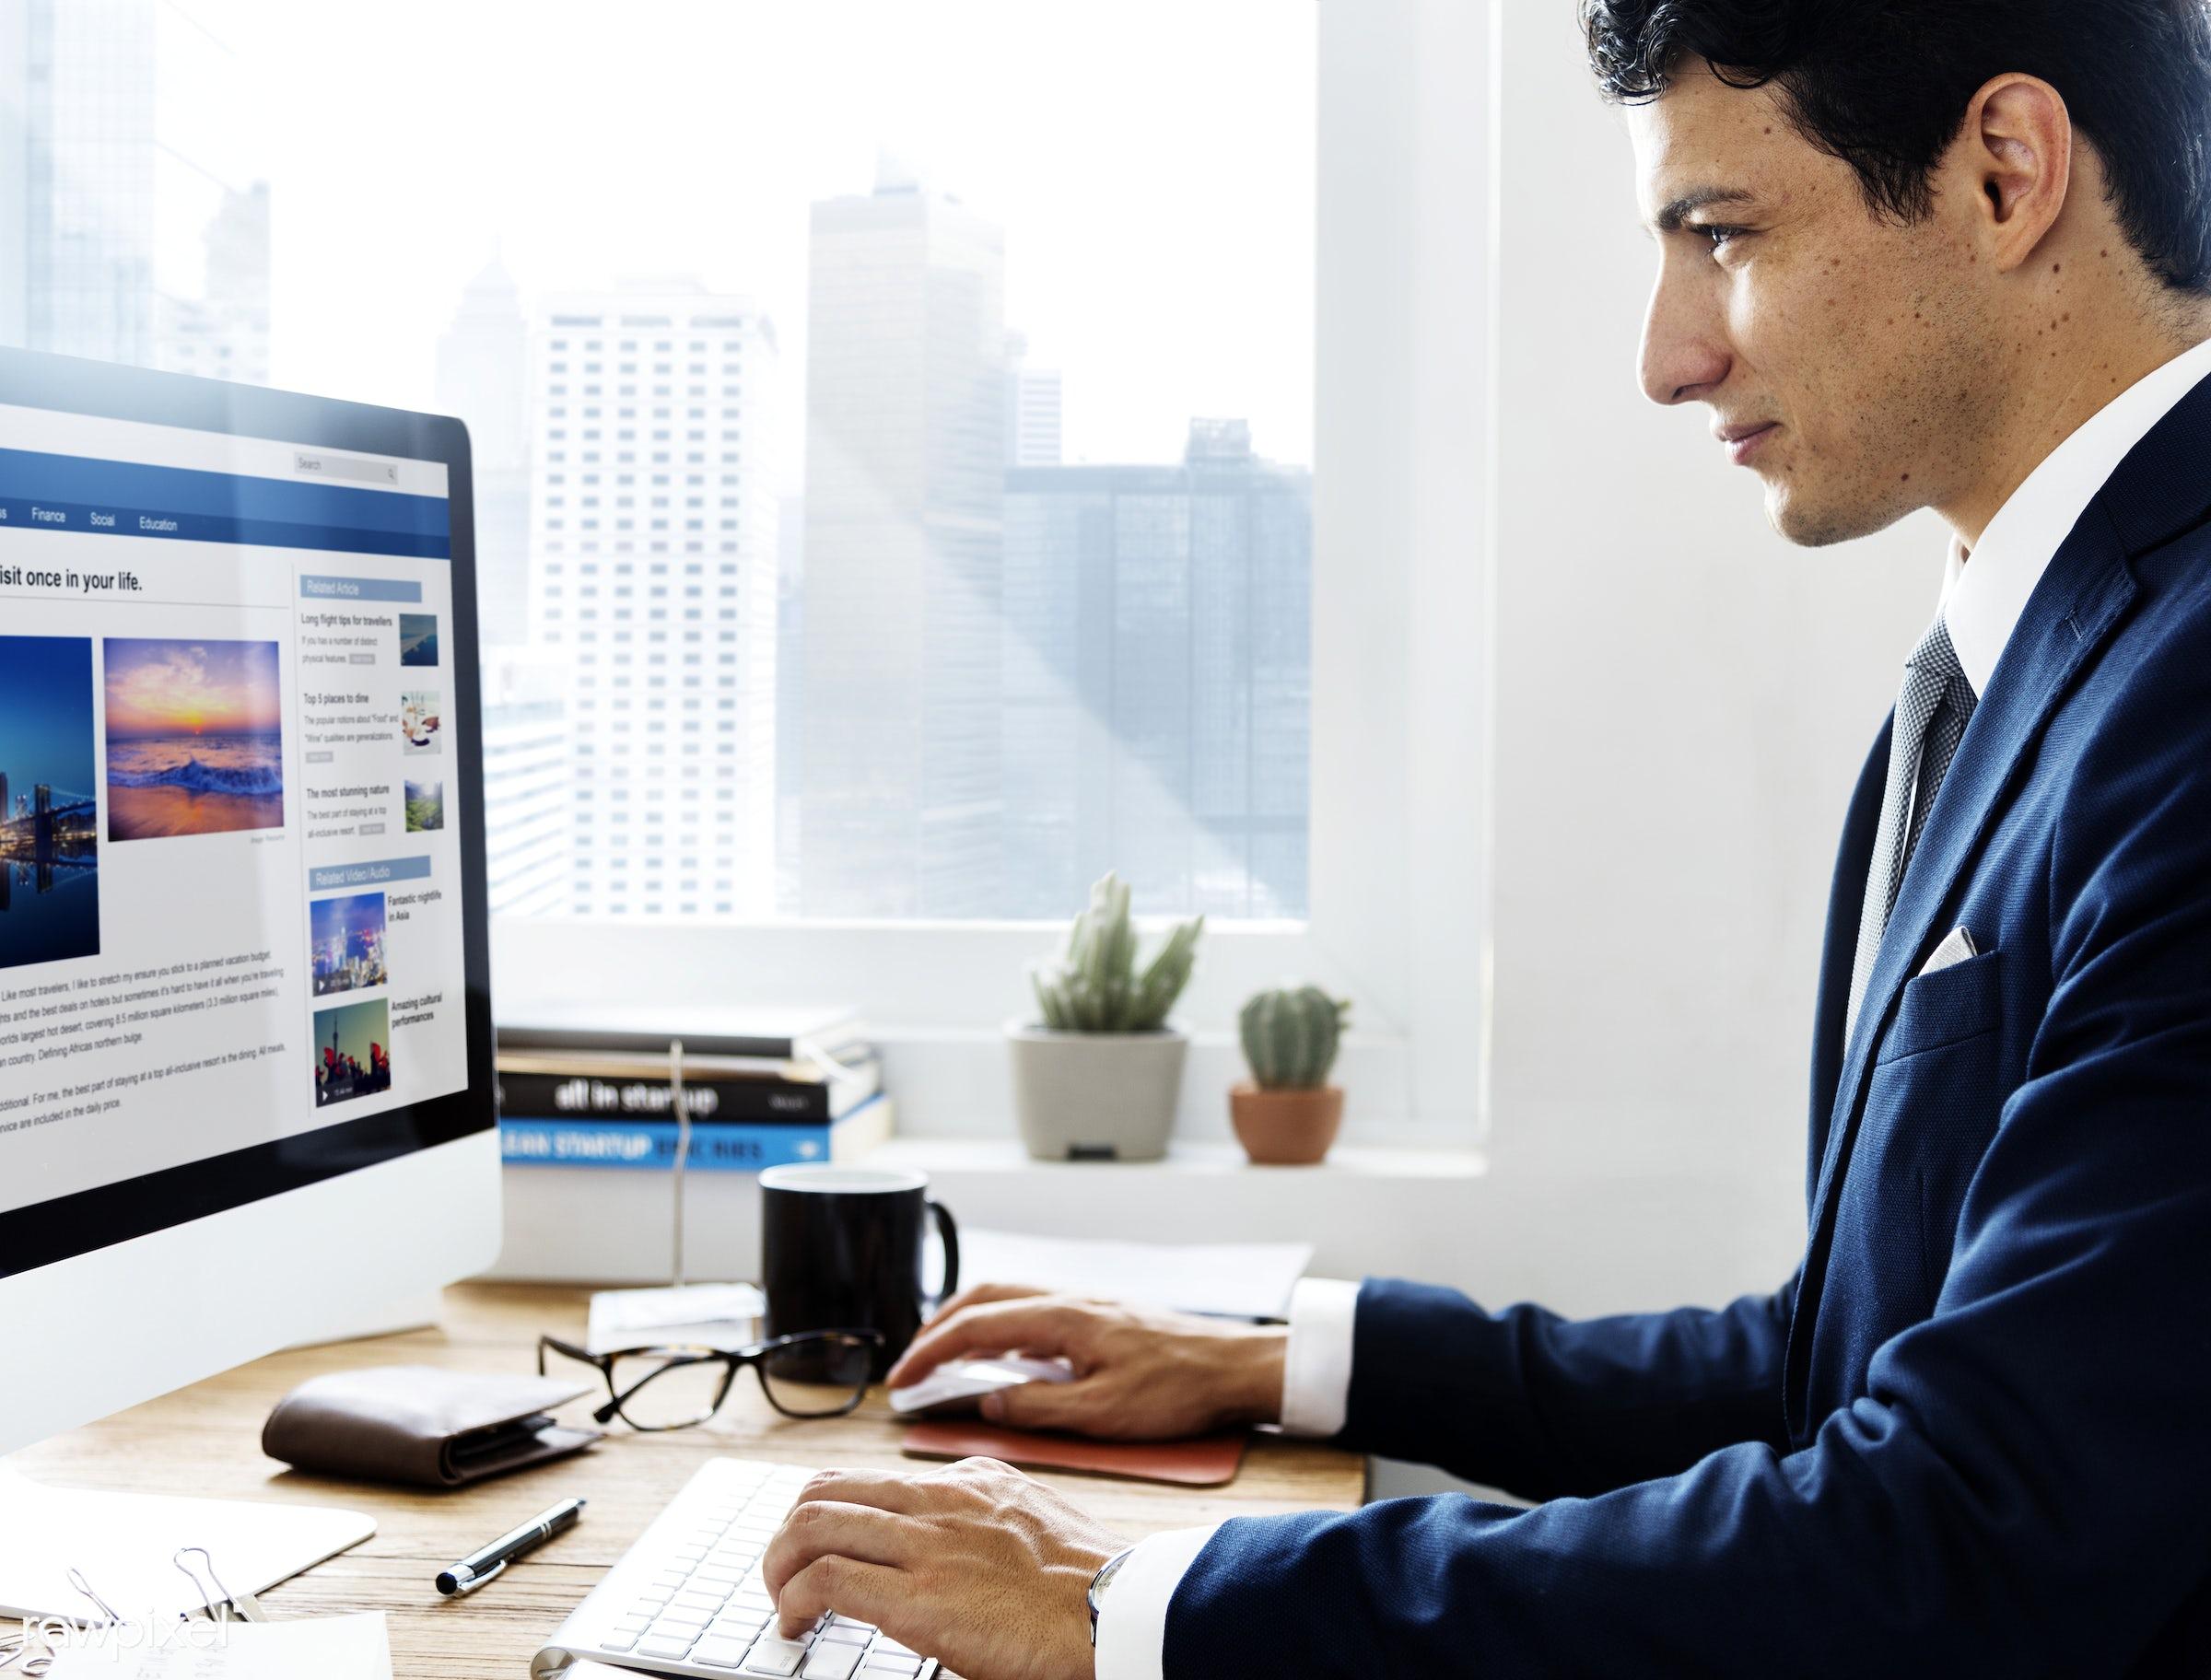 analytics, bar graph, book, business, business plan, businessman, busy, coffee, communication, computer, computer monitor,...